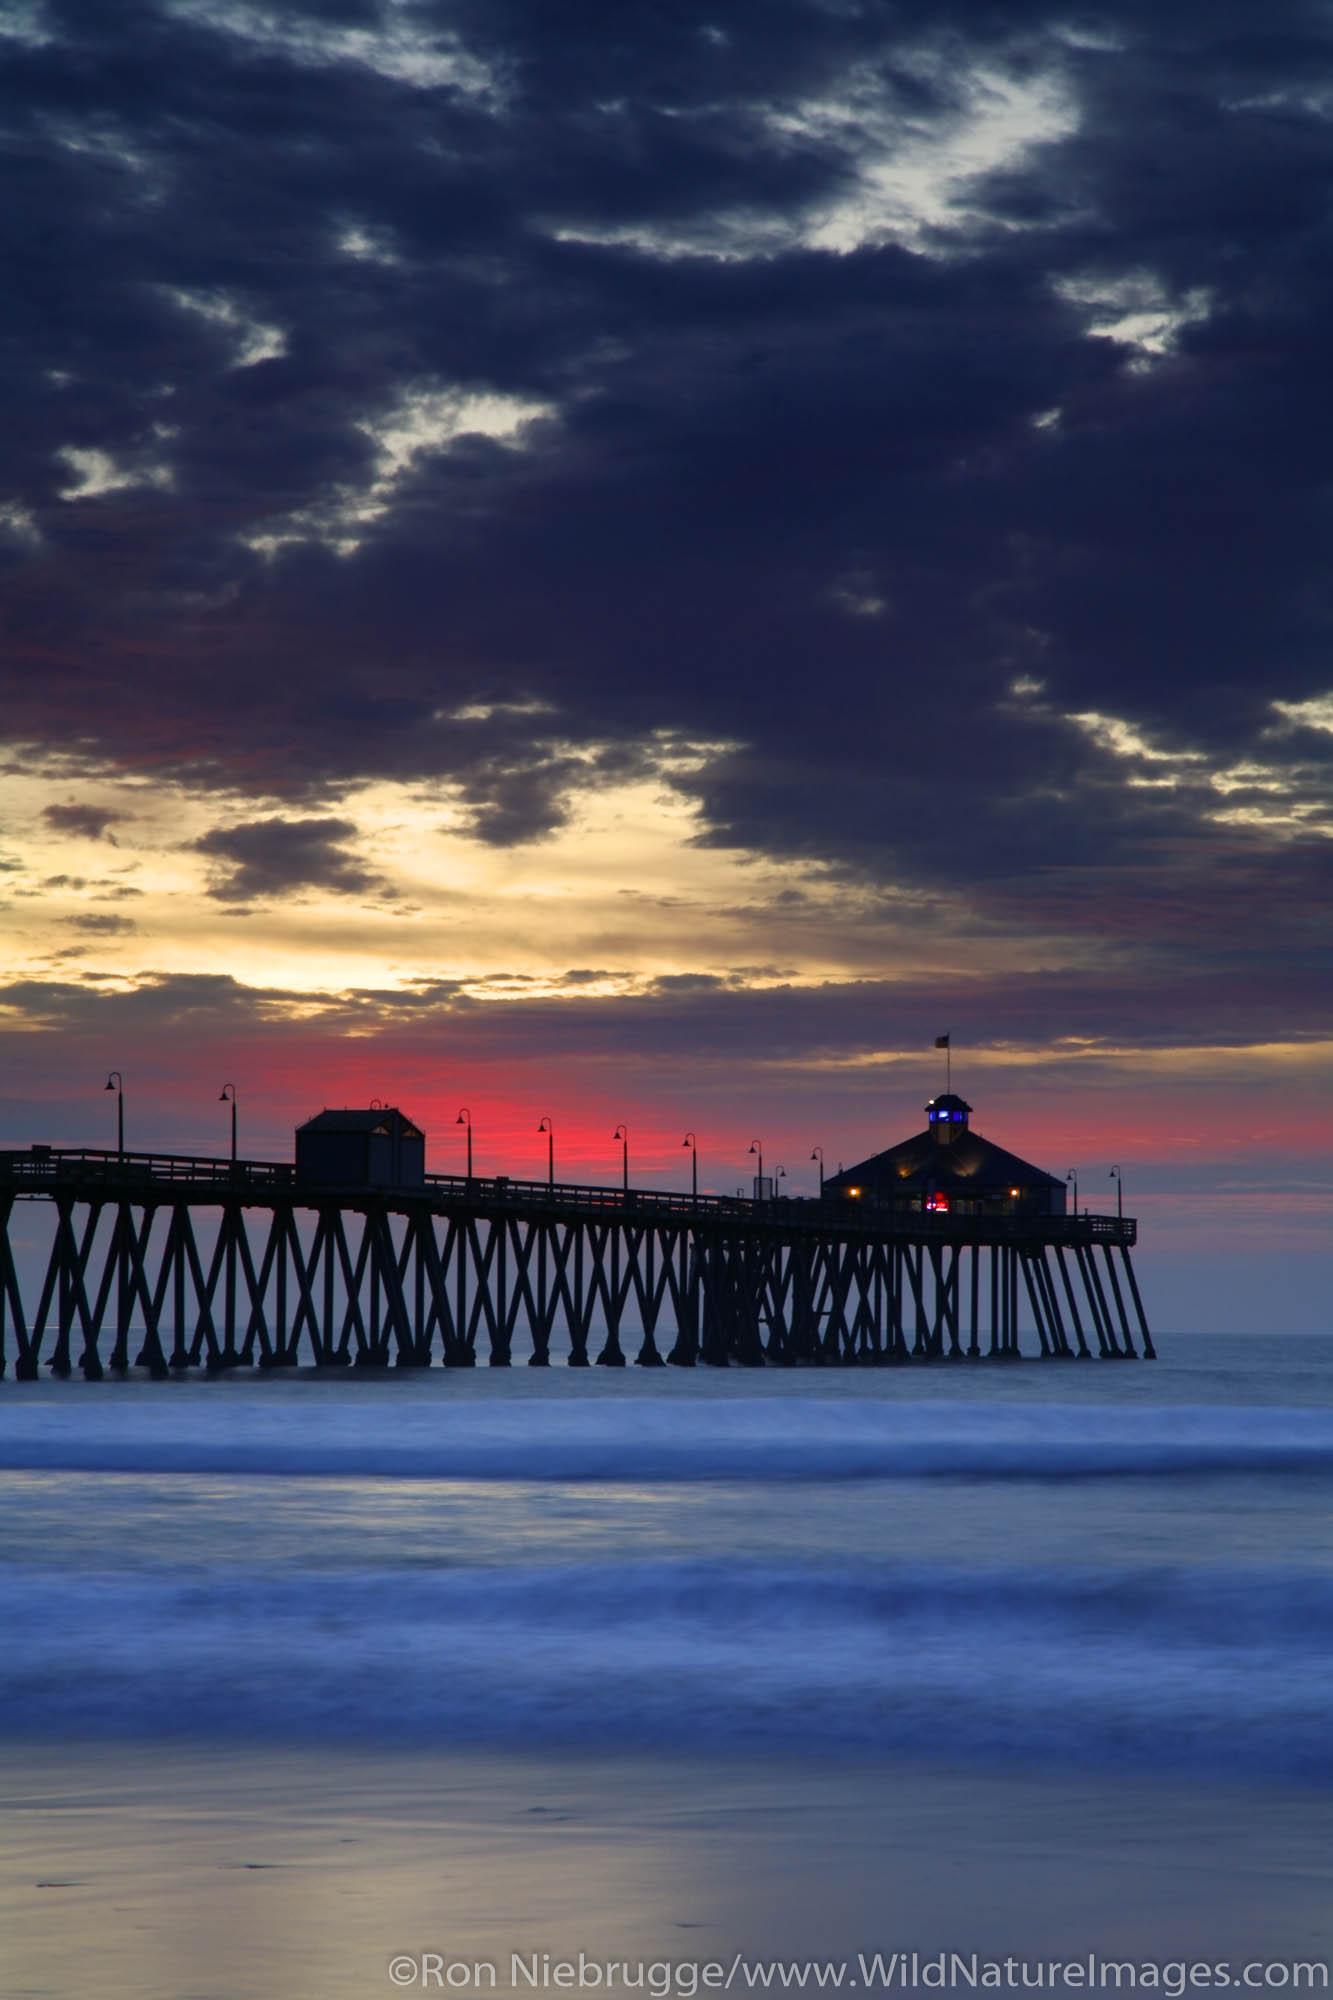 Imperial Beach Municipal Pier at sunset, San Diego County, California.